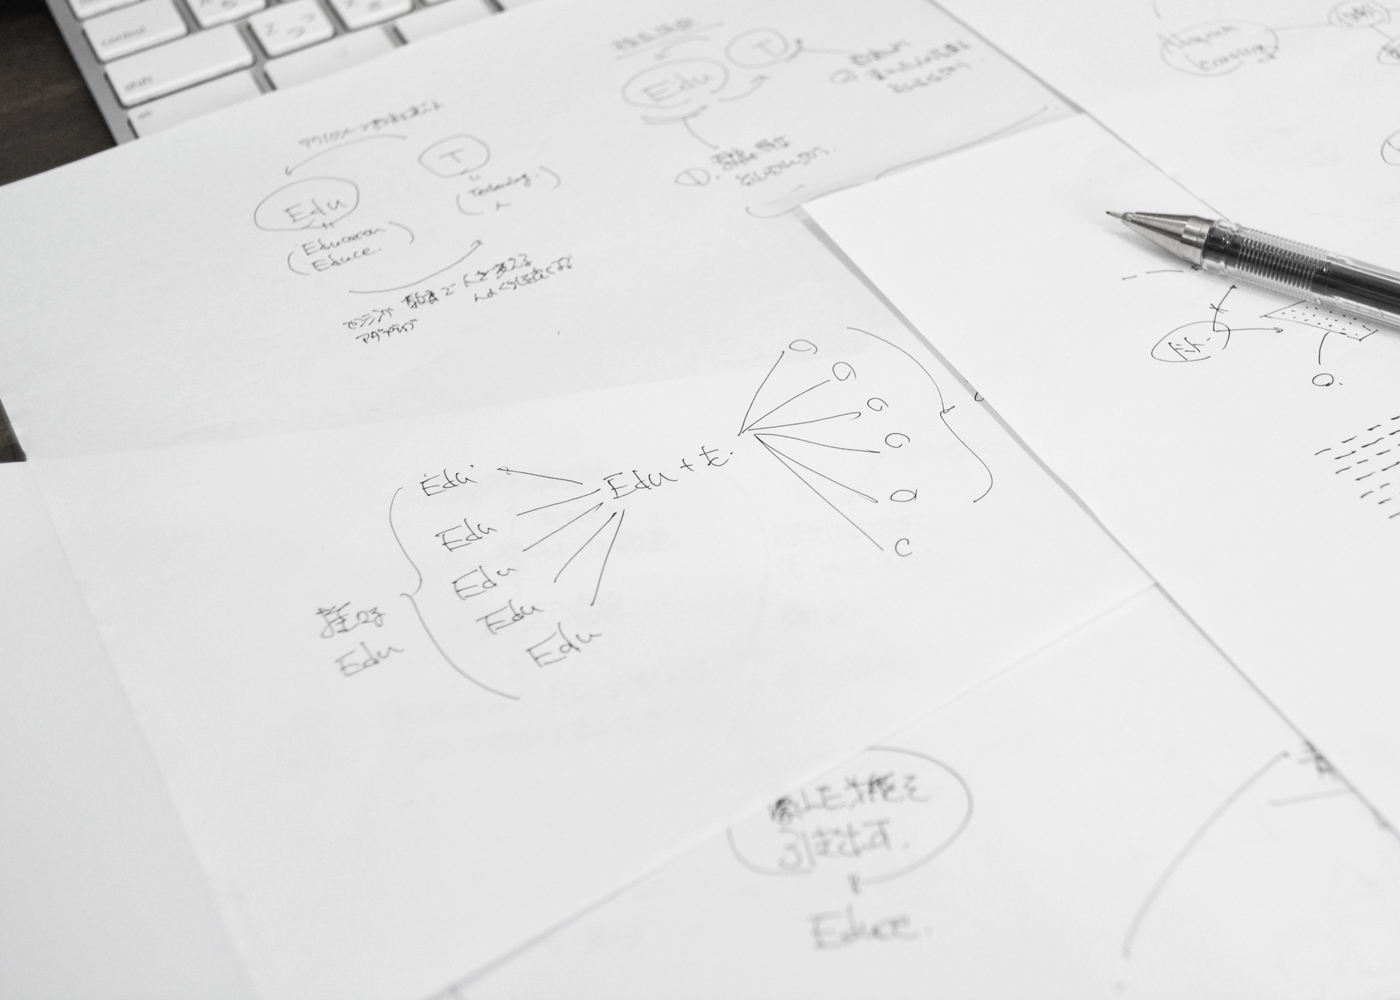 Education sxsw dot coloful business card envelope logo mark brand identity grid Dynamic tokyo japan edtech